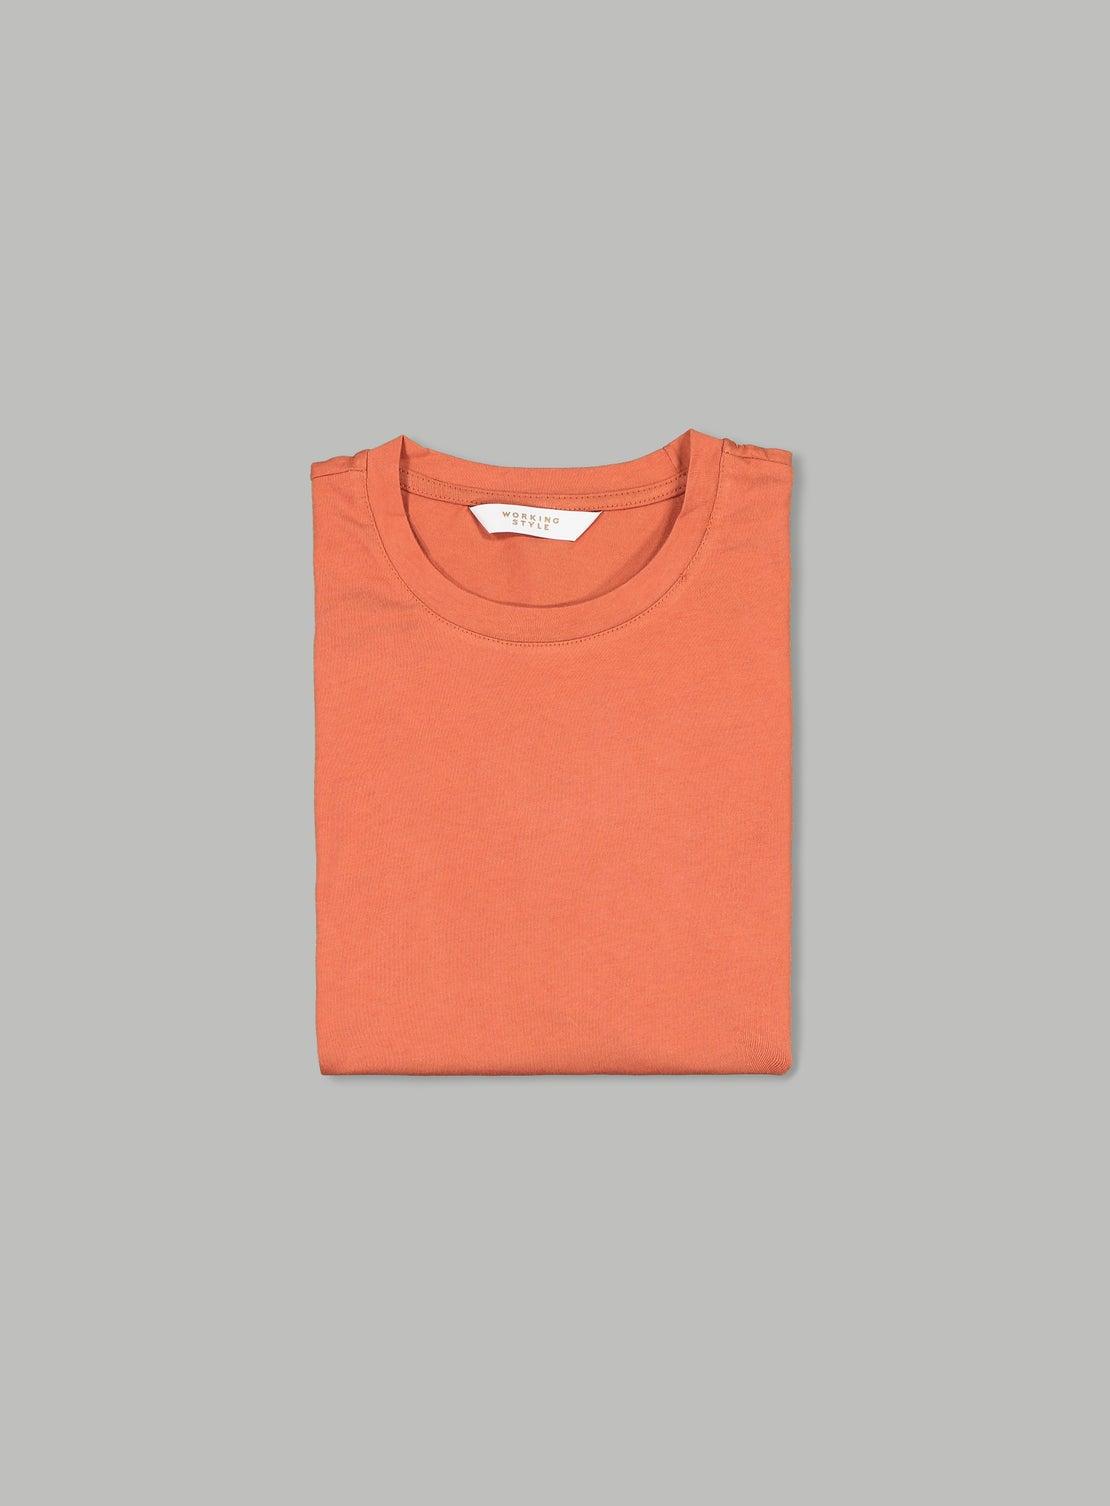 Benny Orange T-Shirt